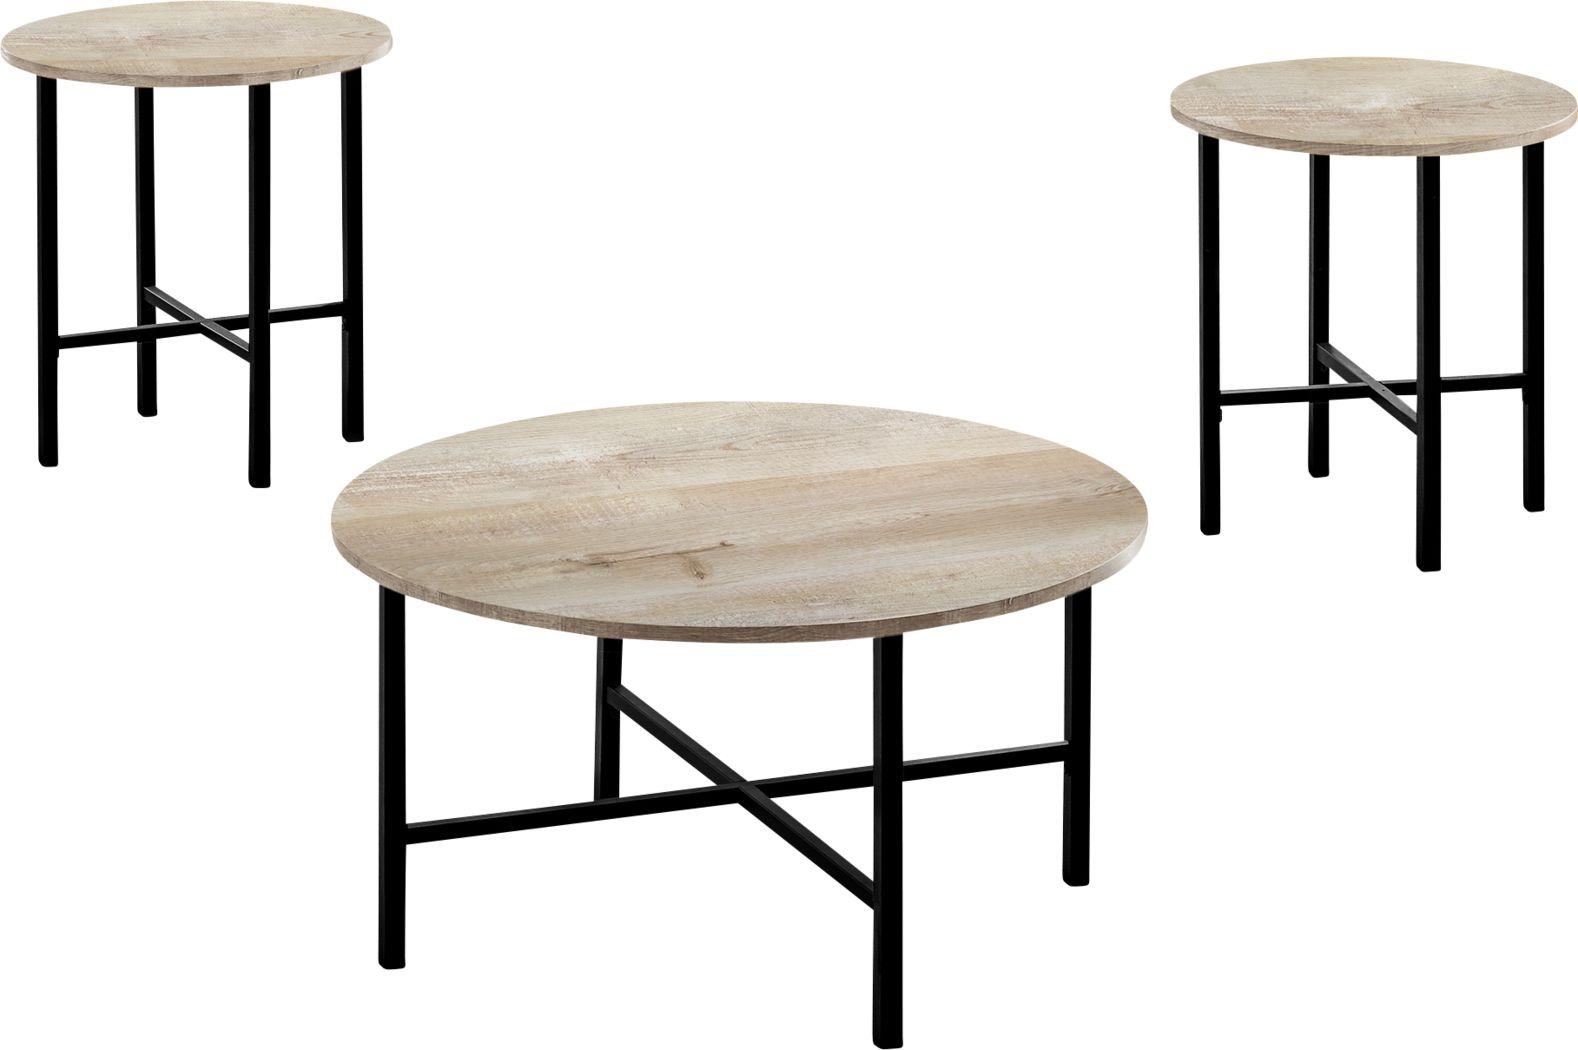 Nakoma Taupe Cocktail Table, Set of 3